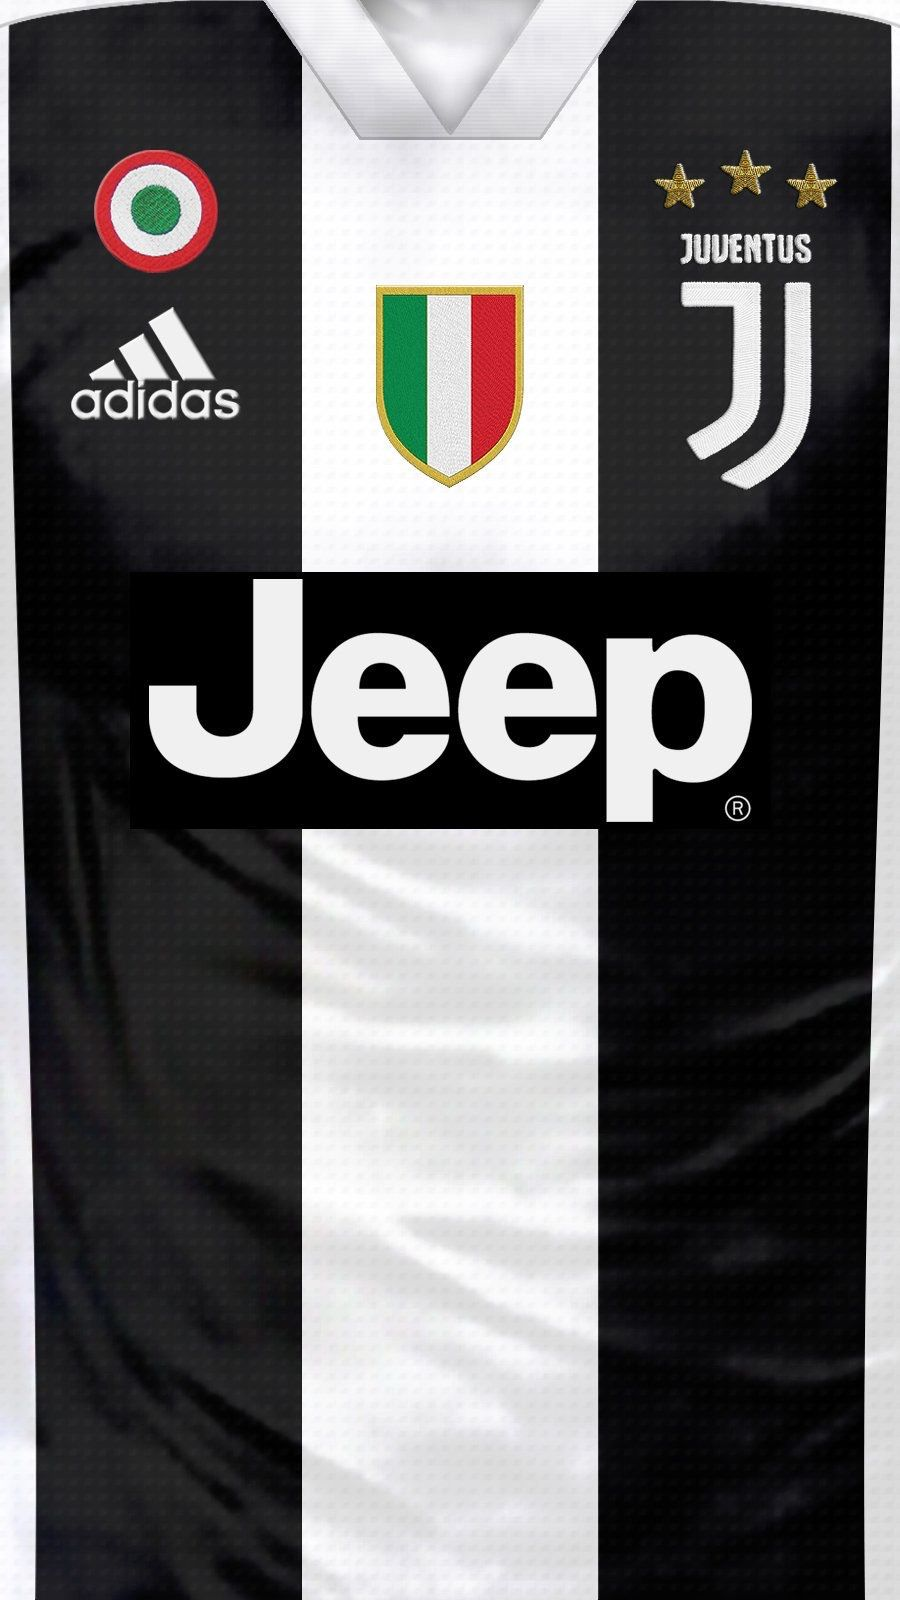 Populer Cr7 Wallpaper 2019 2020 Juventus Paperbola